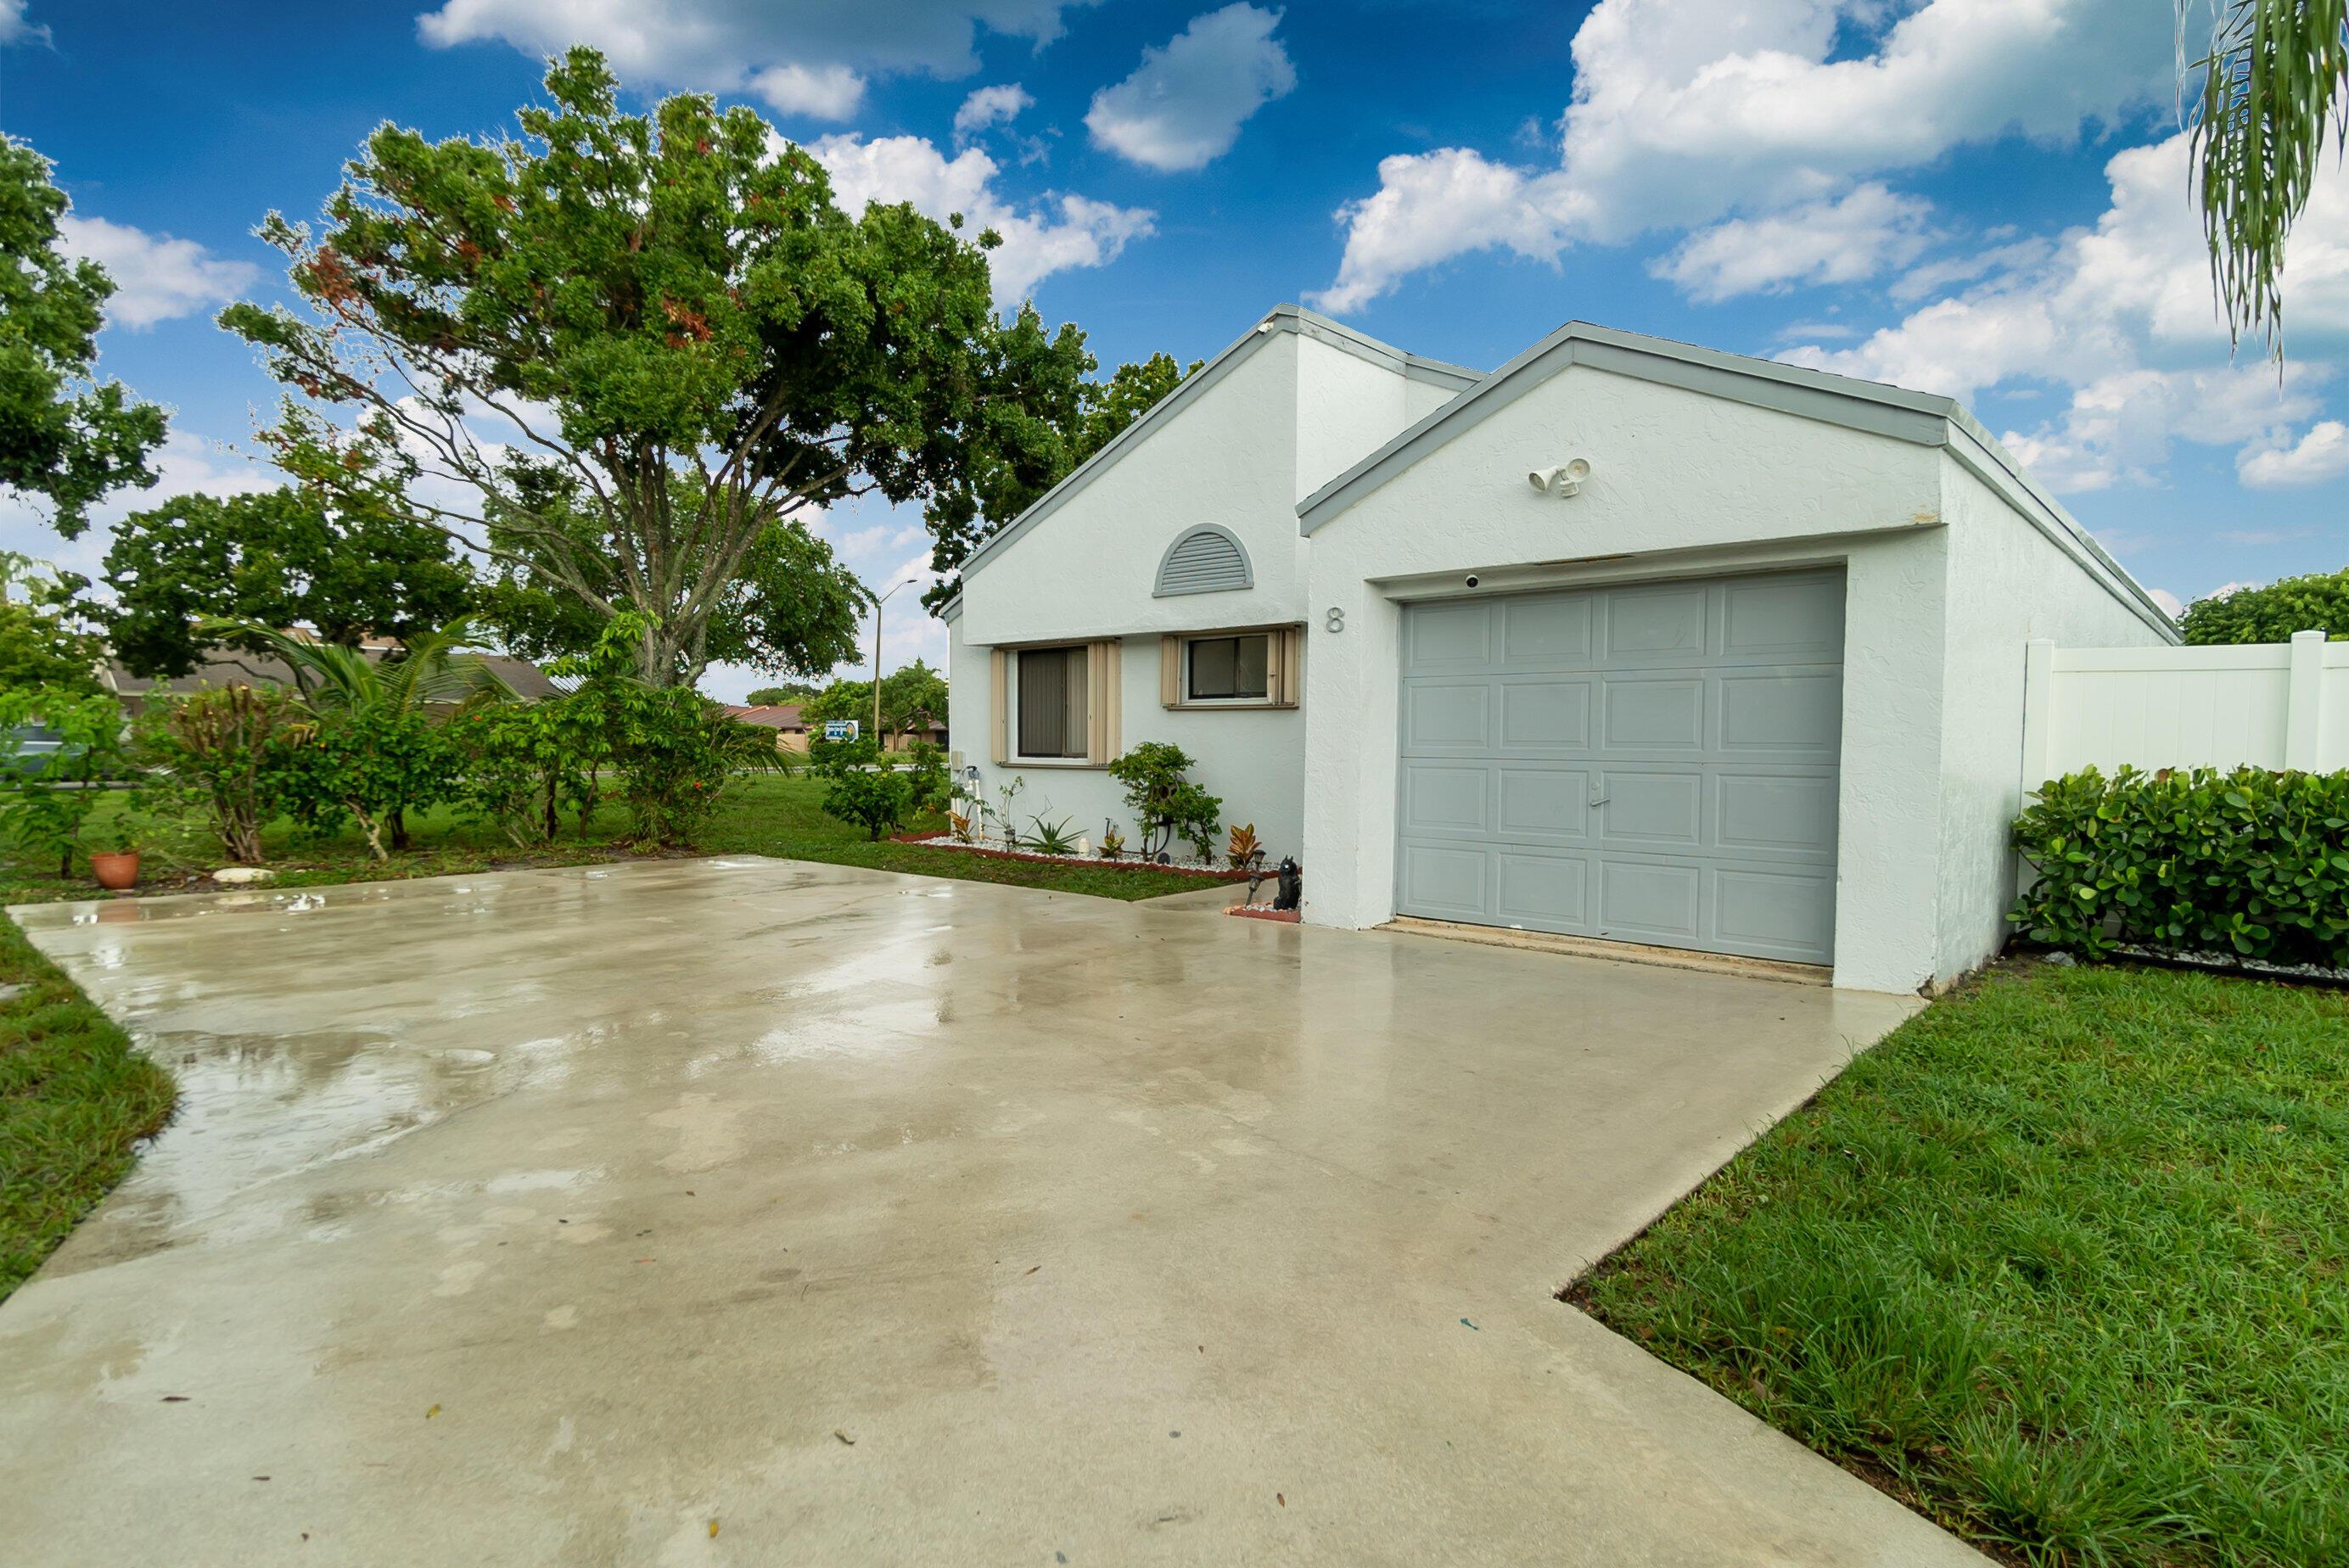 Details for 8 Compton Way, Boynton Beach, FL 33426